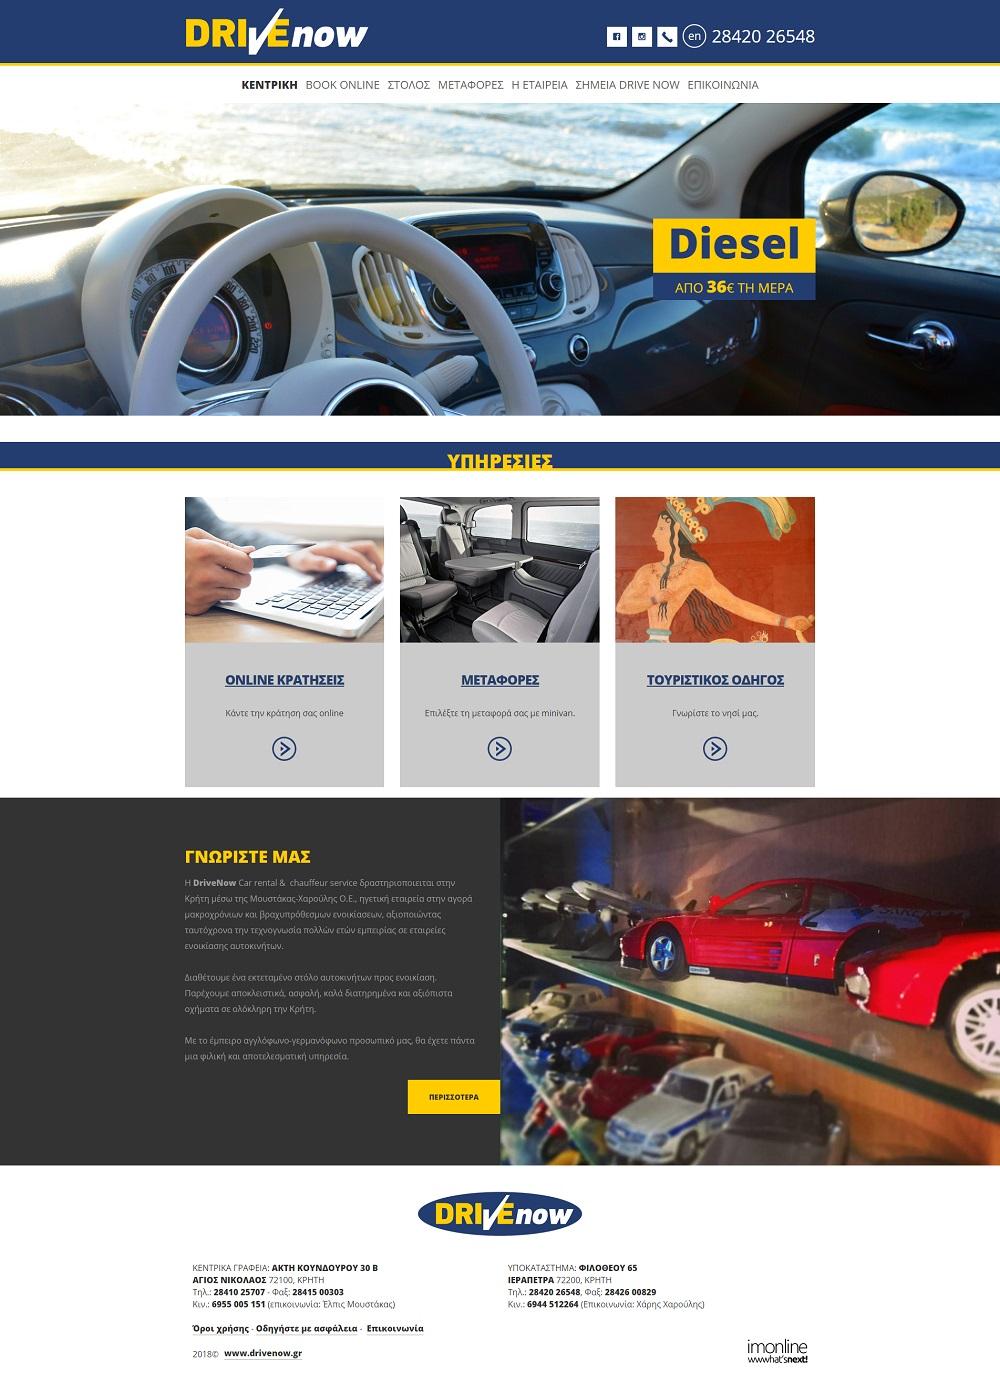 drivenow_website.jpg